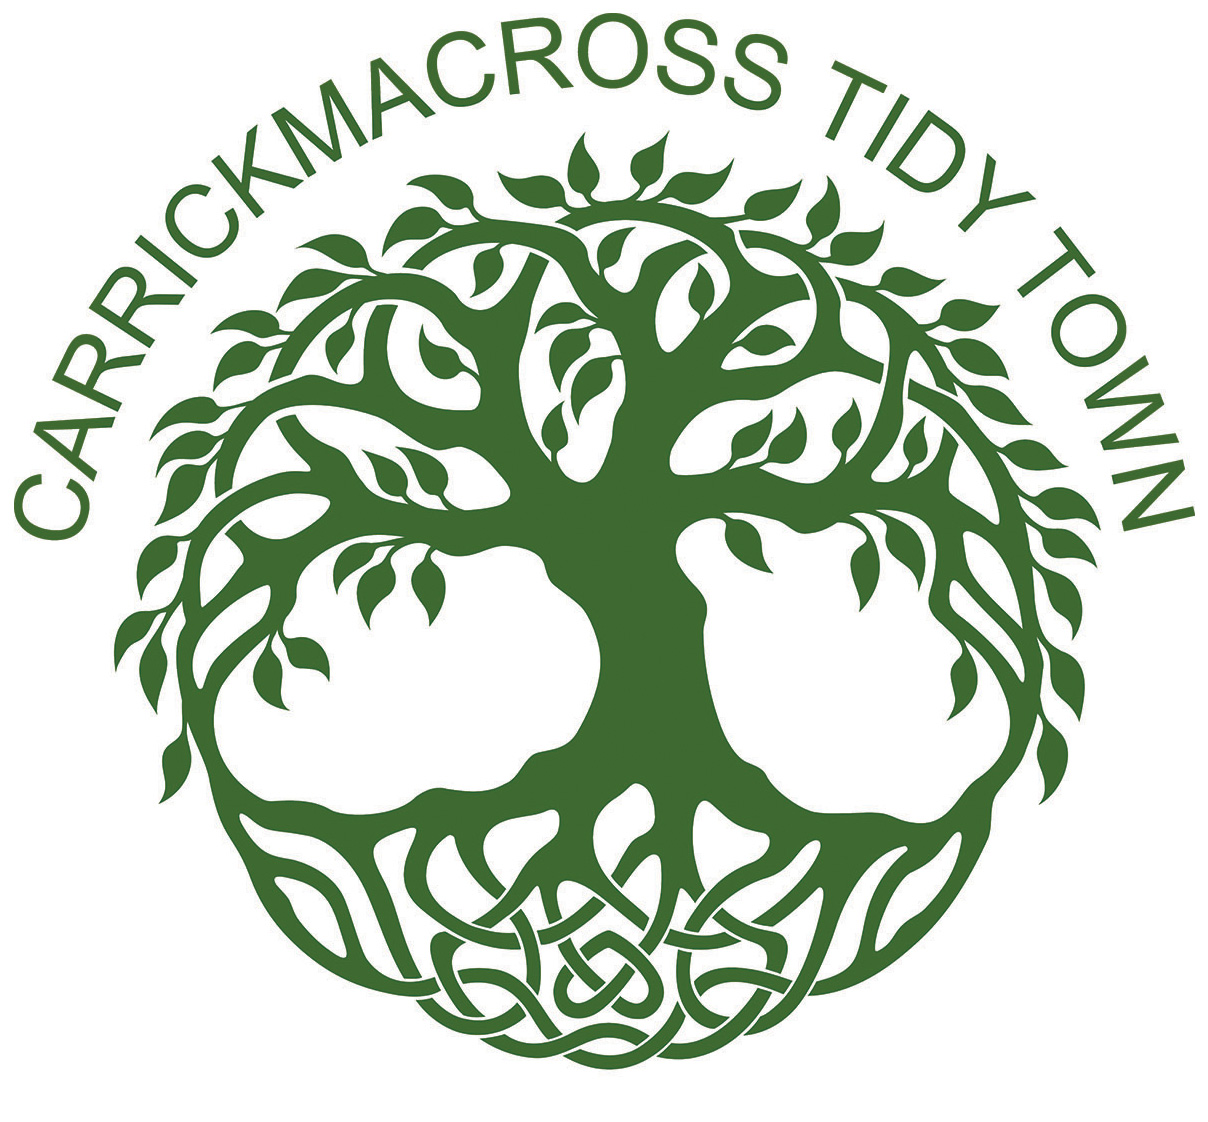 Carrickmacross Tidy Towns